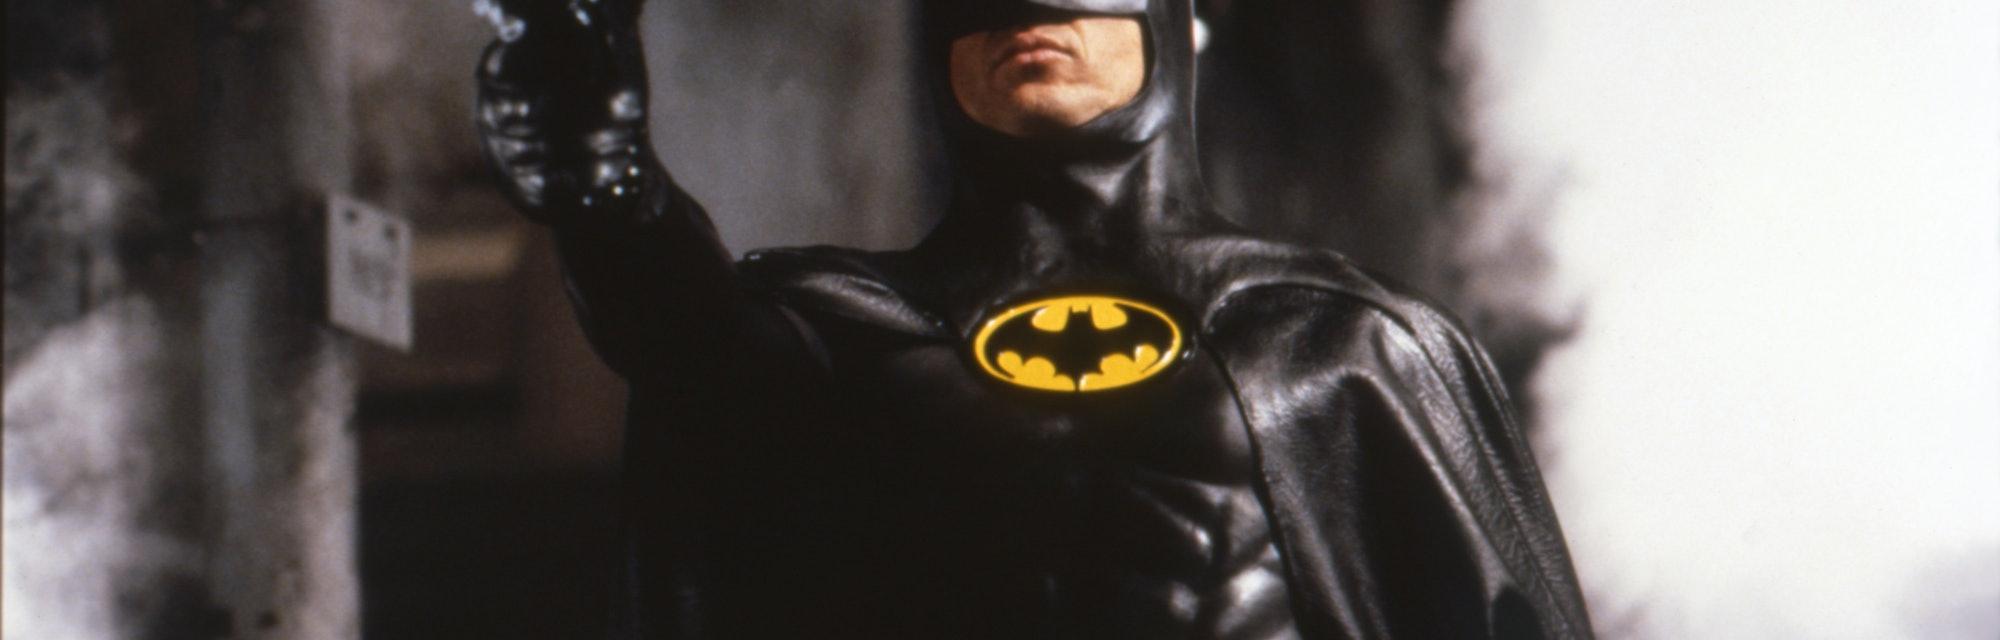 "Michael Keaton on the set of ""Batman"". (Photo by Sunset Boulevard/Corbis via Getty Images)"